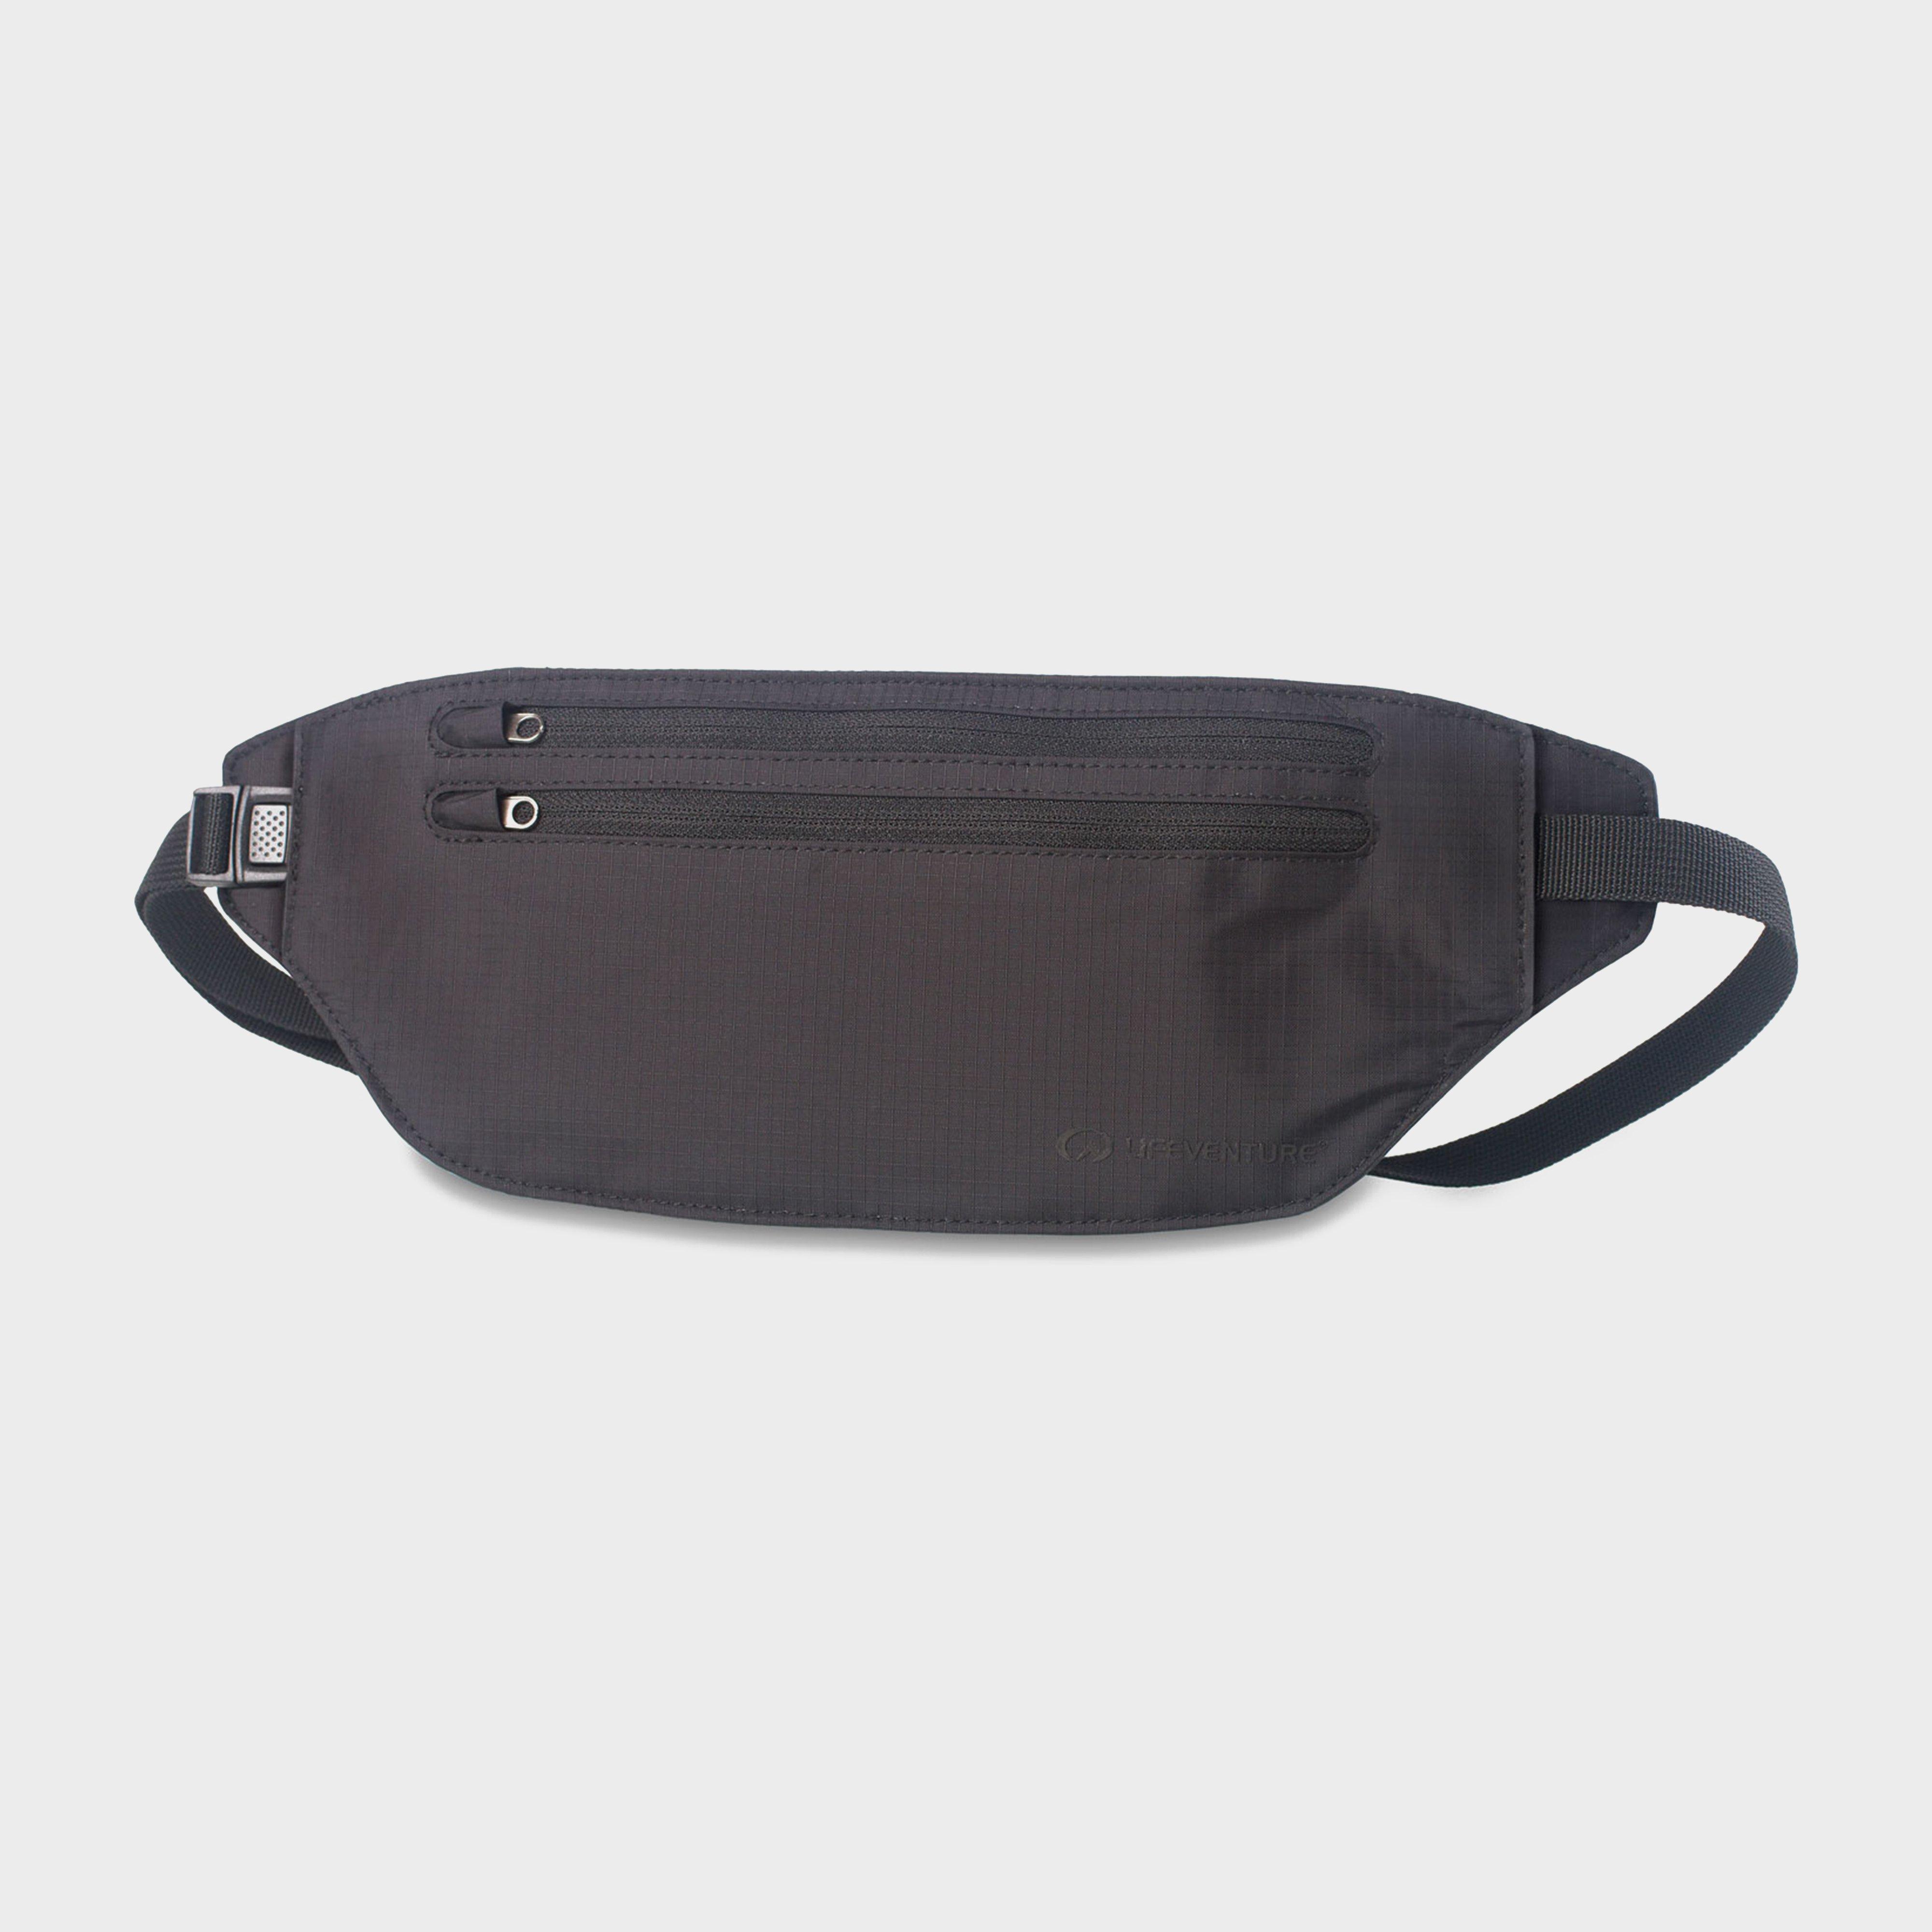 Lifeventure Hydroseal Body Wallet, Black